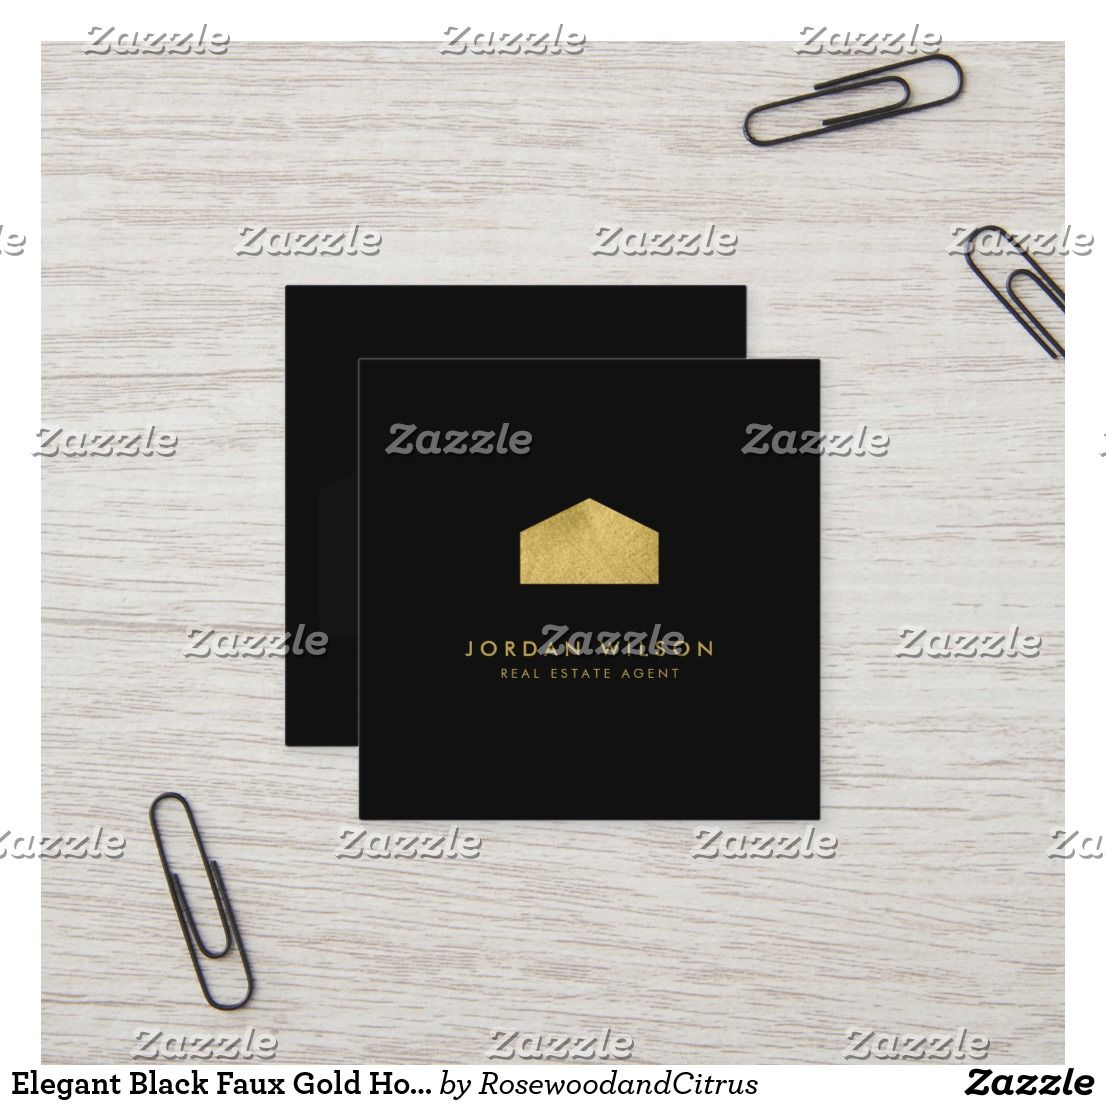 Elegant Black Faux Gold House Real Estate Business Cards Visit Carte De Visite